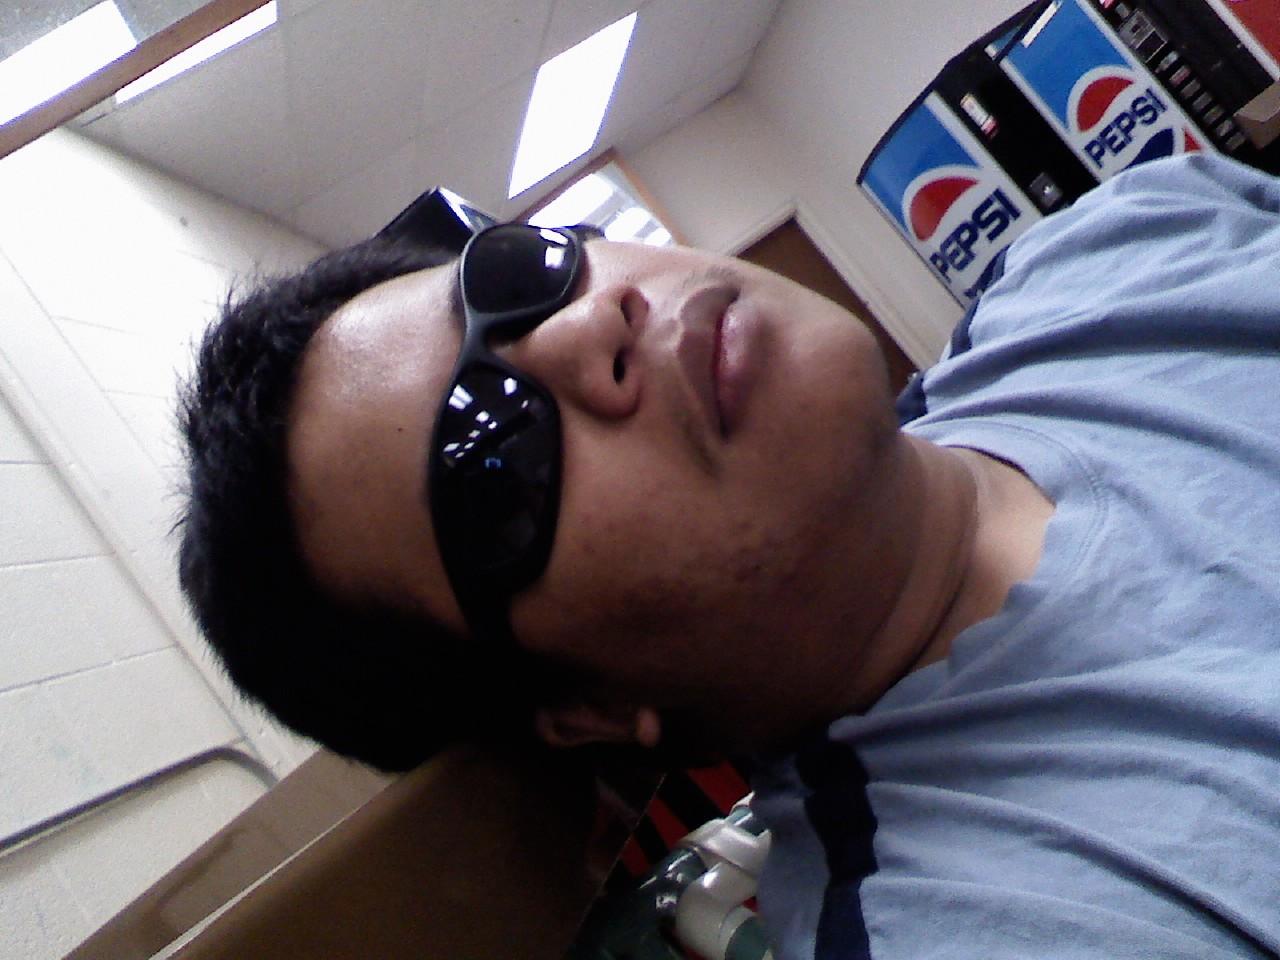 Jerome Madlangbayan